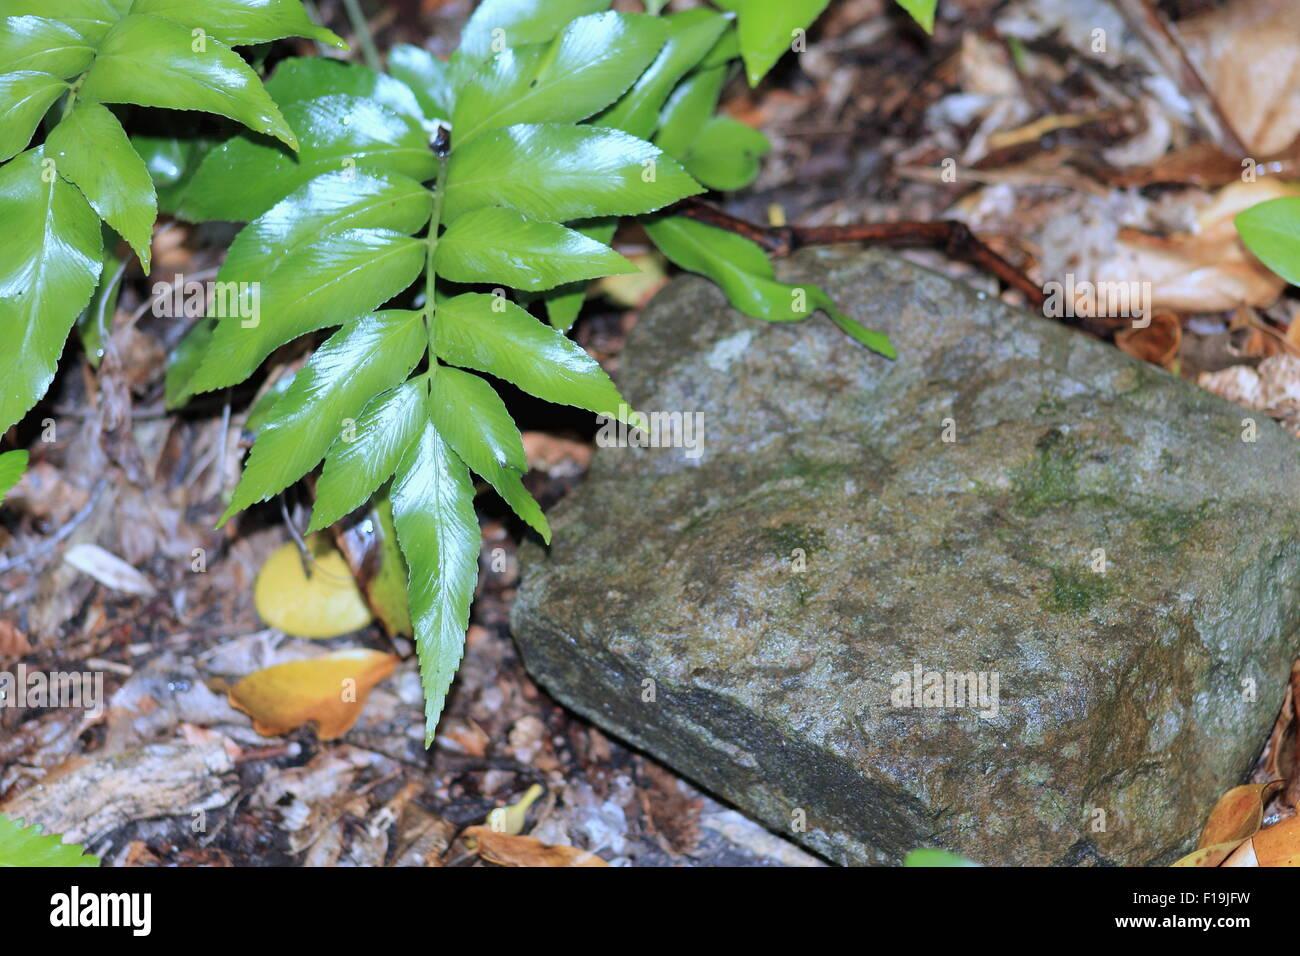 Shining Spleenwort - Stock Image